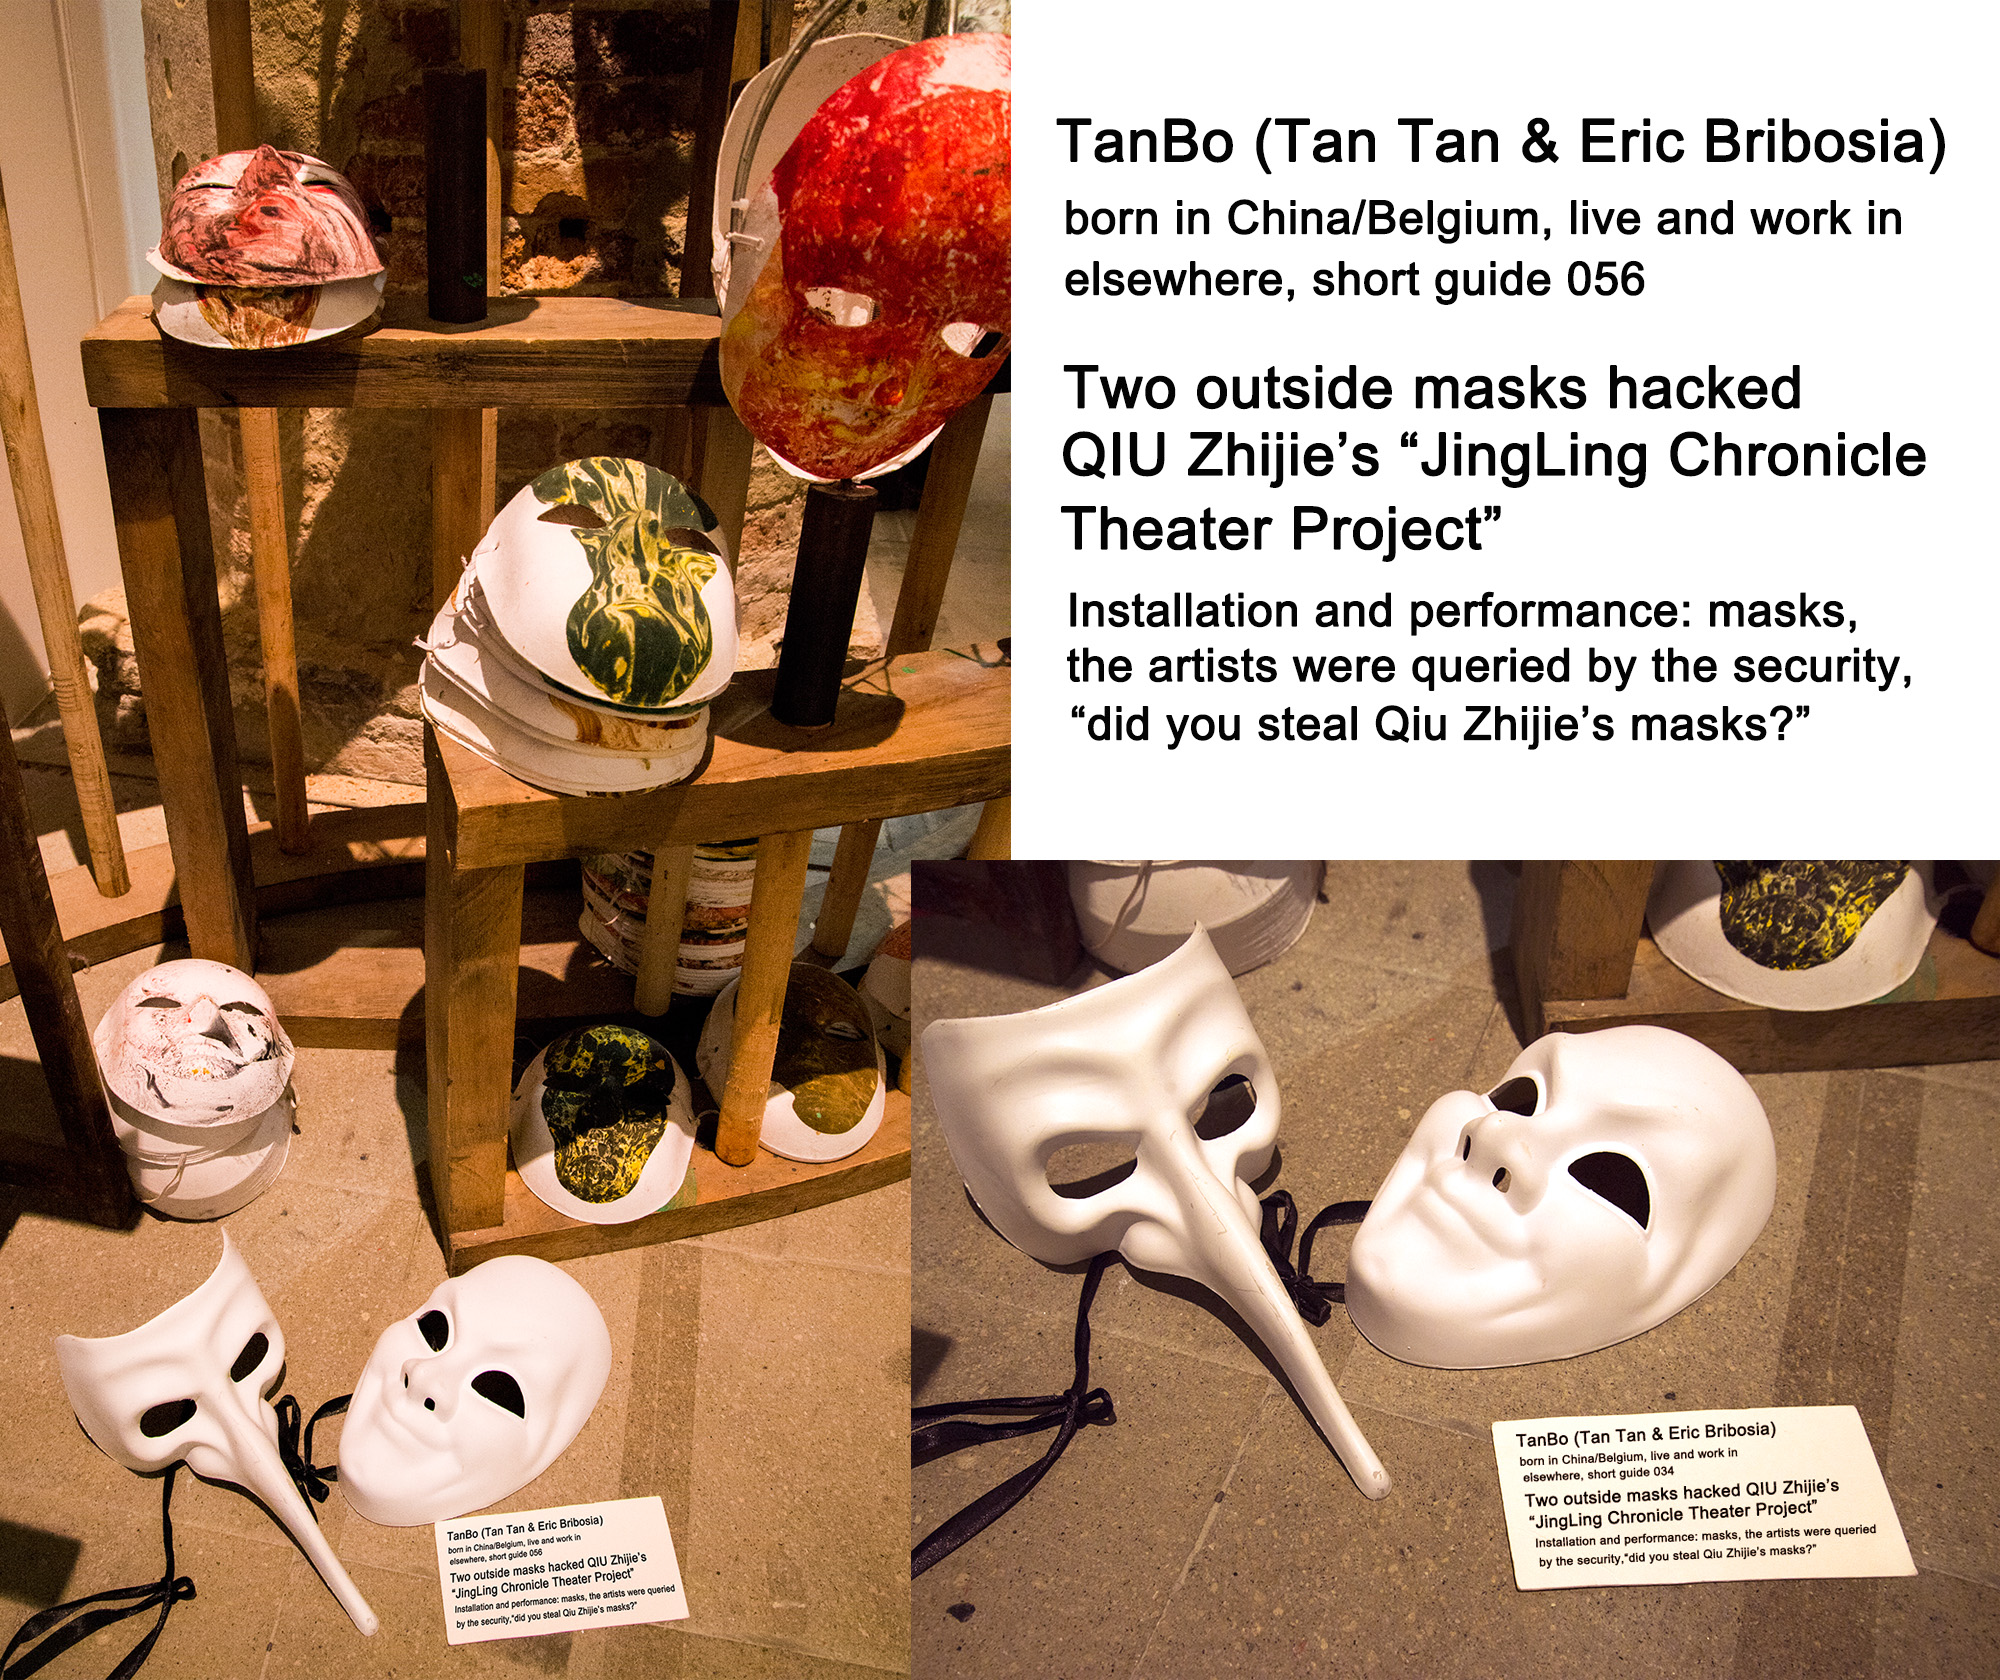 "TanBo在""Venize双年展""上的作品《两个外来的面具黑客入侵了邱志杰的<金陵剧场>》"